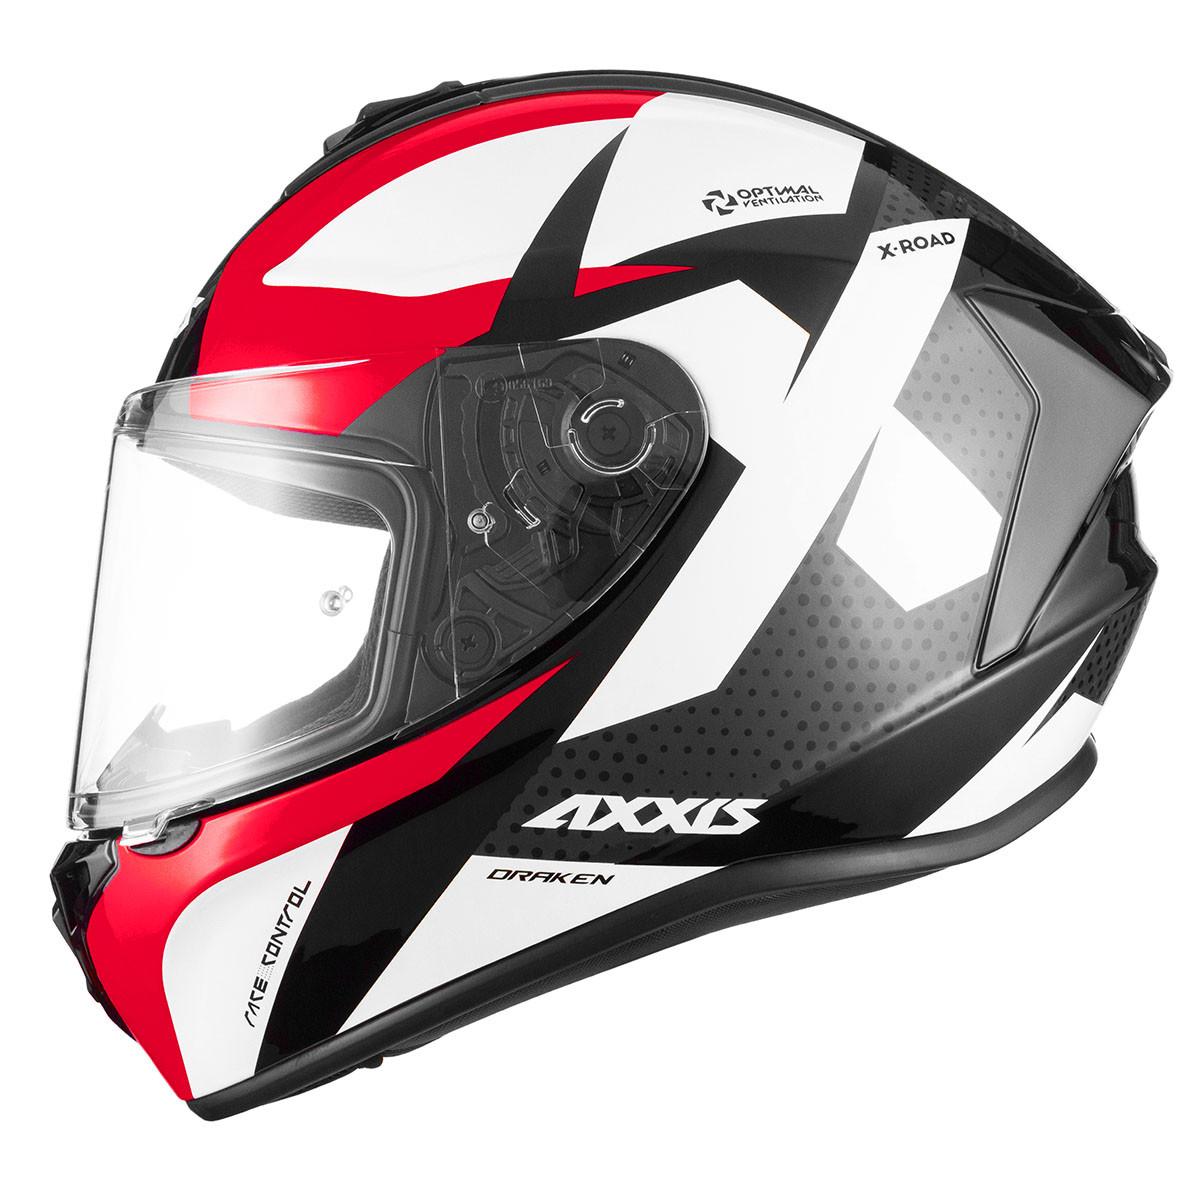 Casco Integral Axxis Draken X-road B2 Rojo